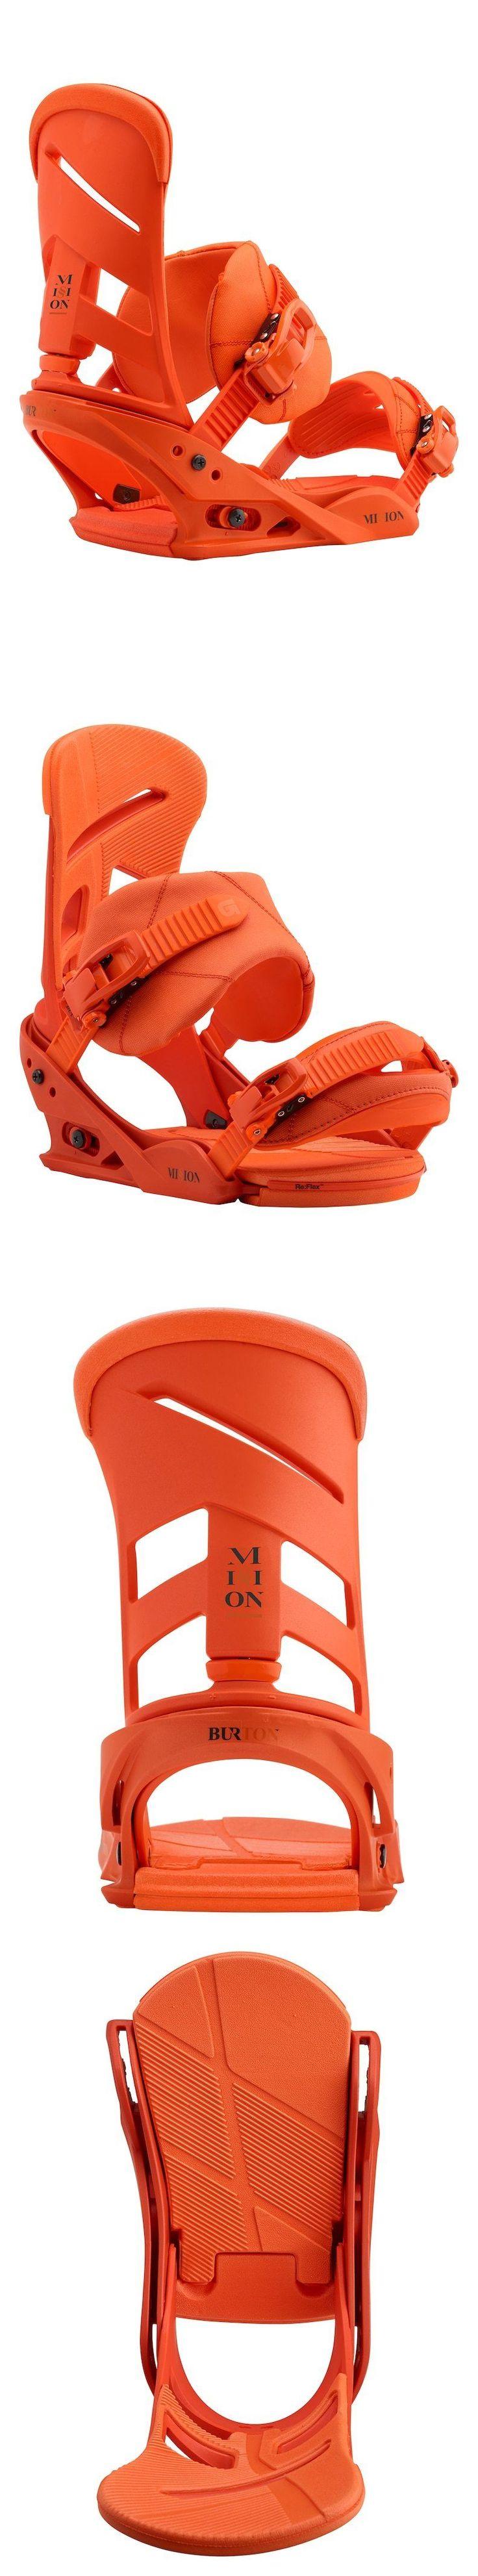 Bindings 21248: Burton Mission Snowboard Bindings - 2018 - Large (Men S Boot Size 11+), Orange -> BUY IT NOW ONLY: $249.95 on eBay!